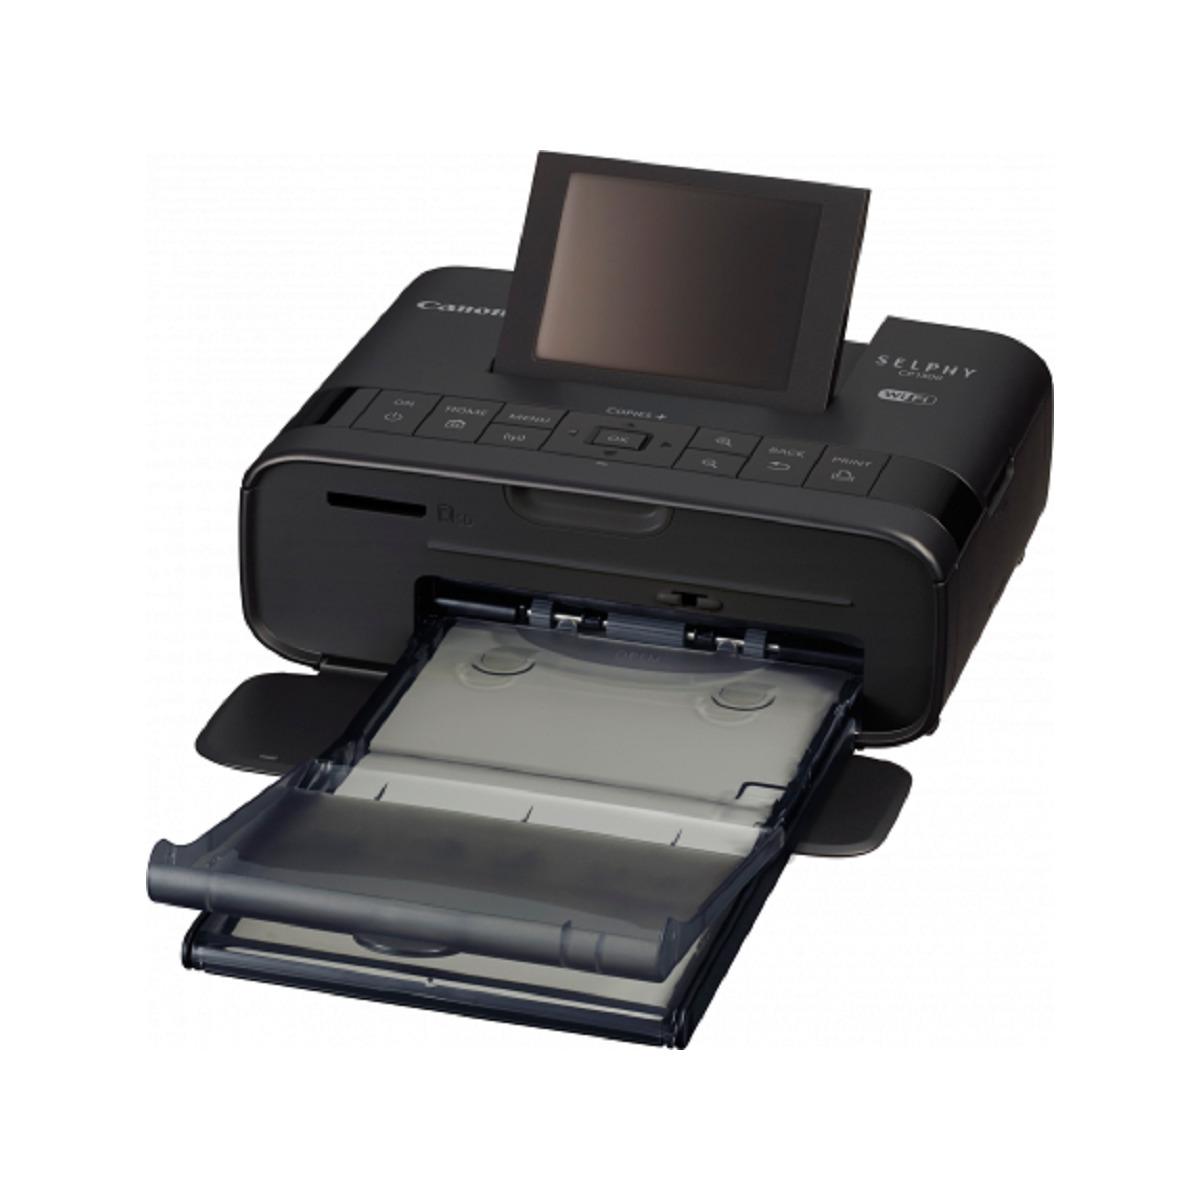 Canon Selphy CP1300 Compact Photo Printer - Black   BIG W